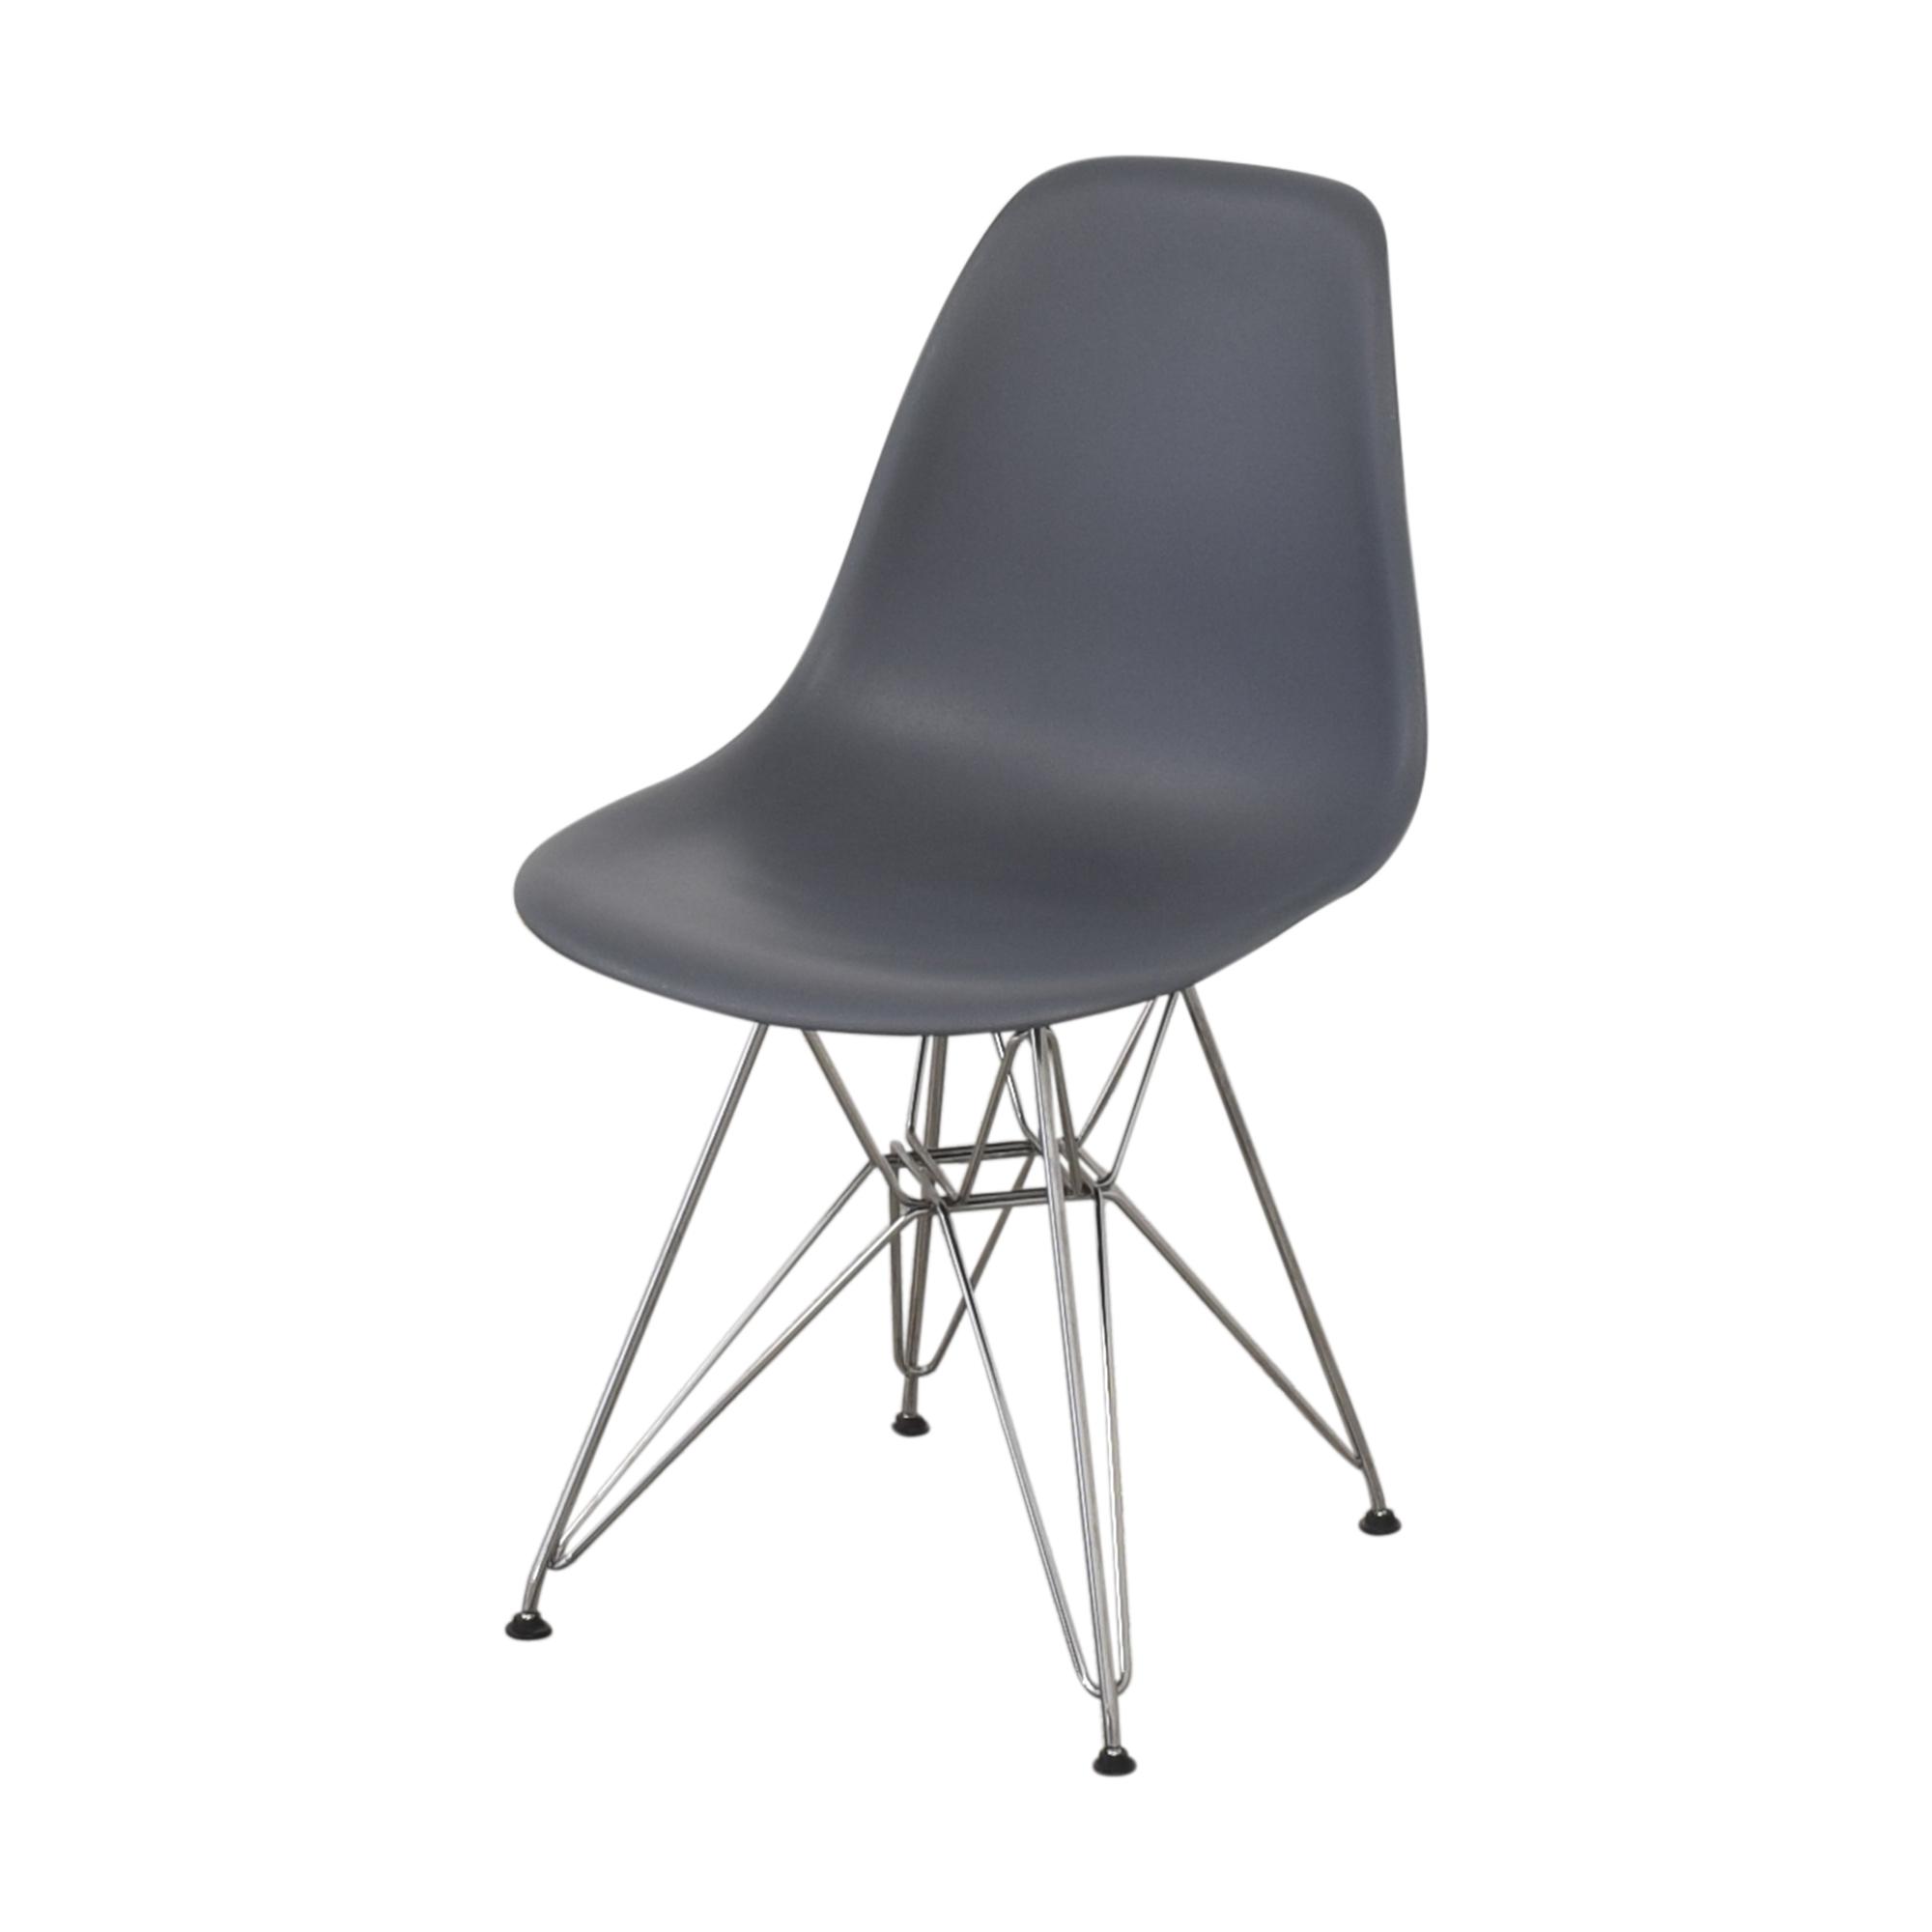 buy Design Within Reach Herman Miller Eames Molded Side Chairs Design Within Reach Accent Chairs